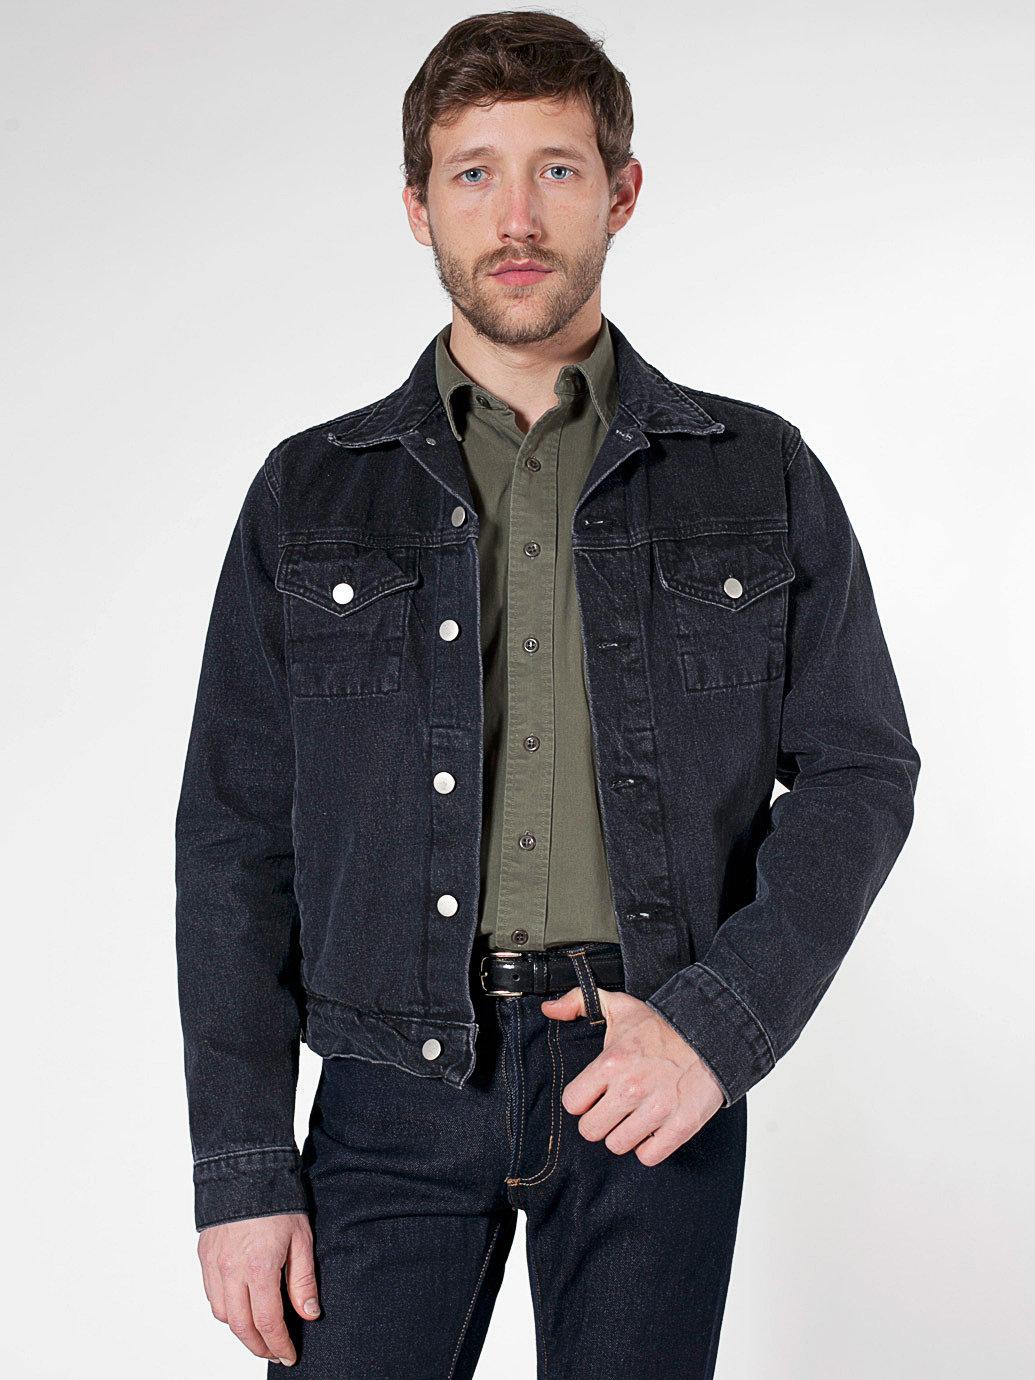 Denim Jacket | American Apparel